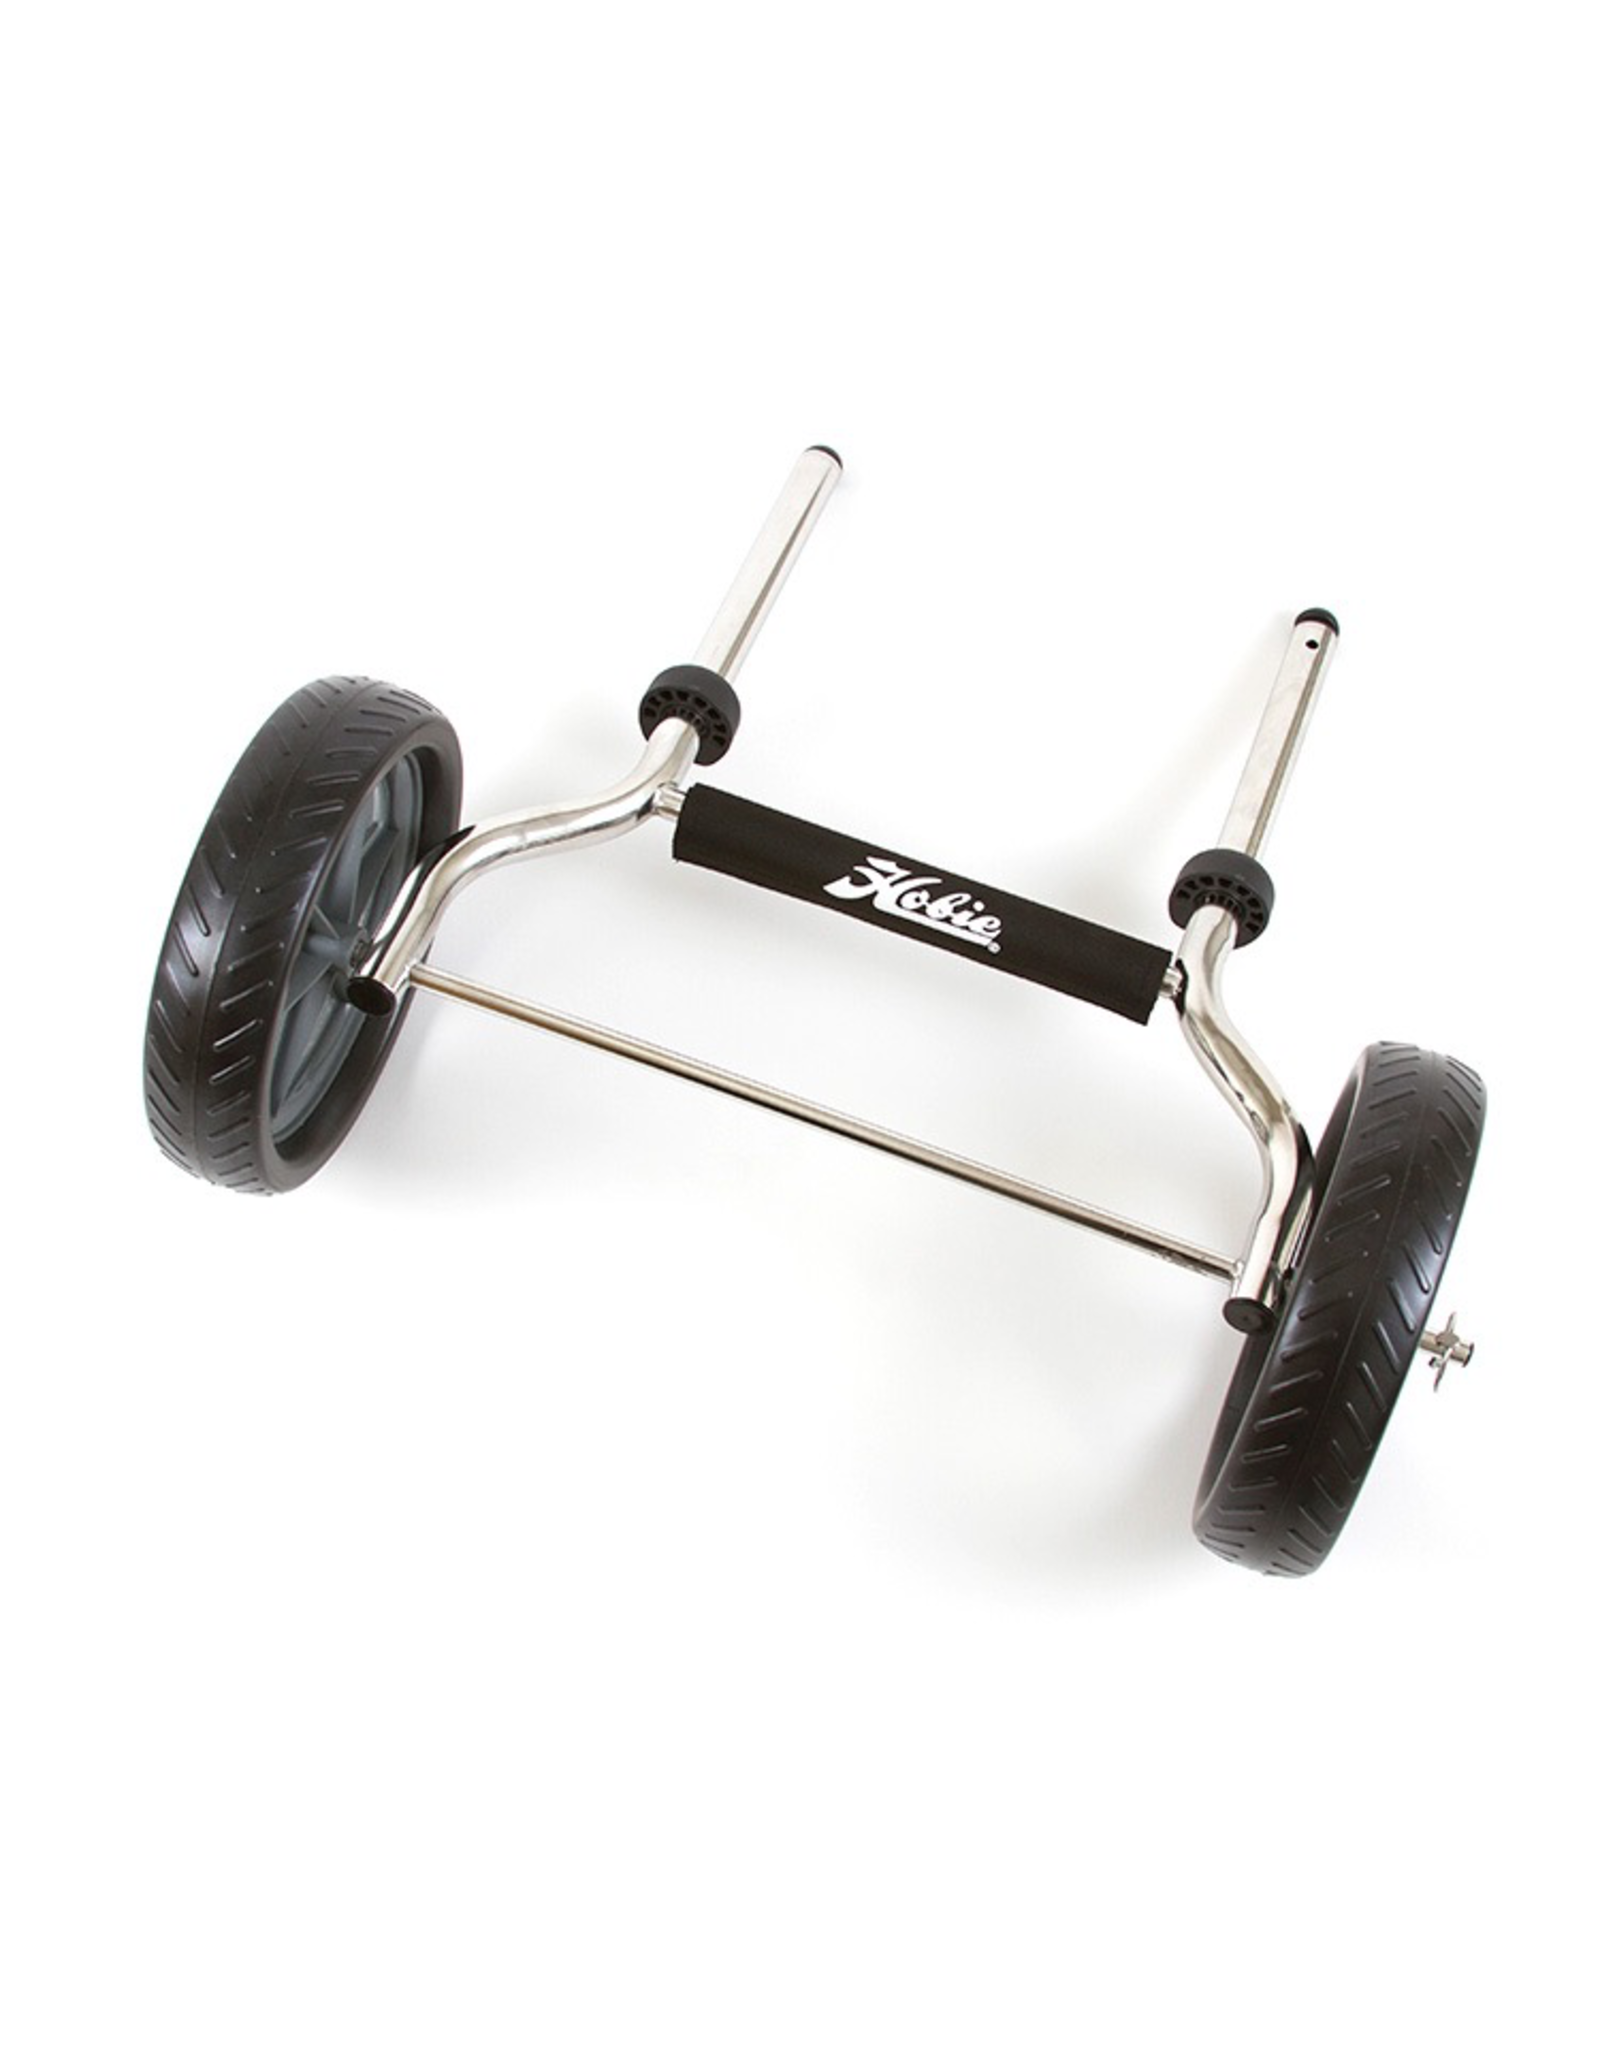 Hobie Hobie Standard Plug-in Cart for Hobie Kayaks